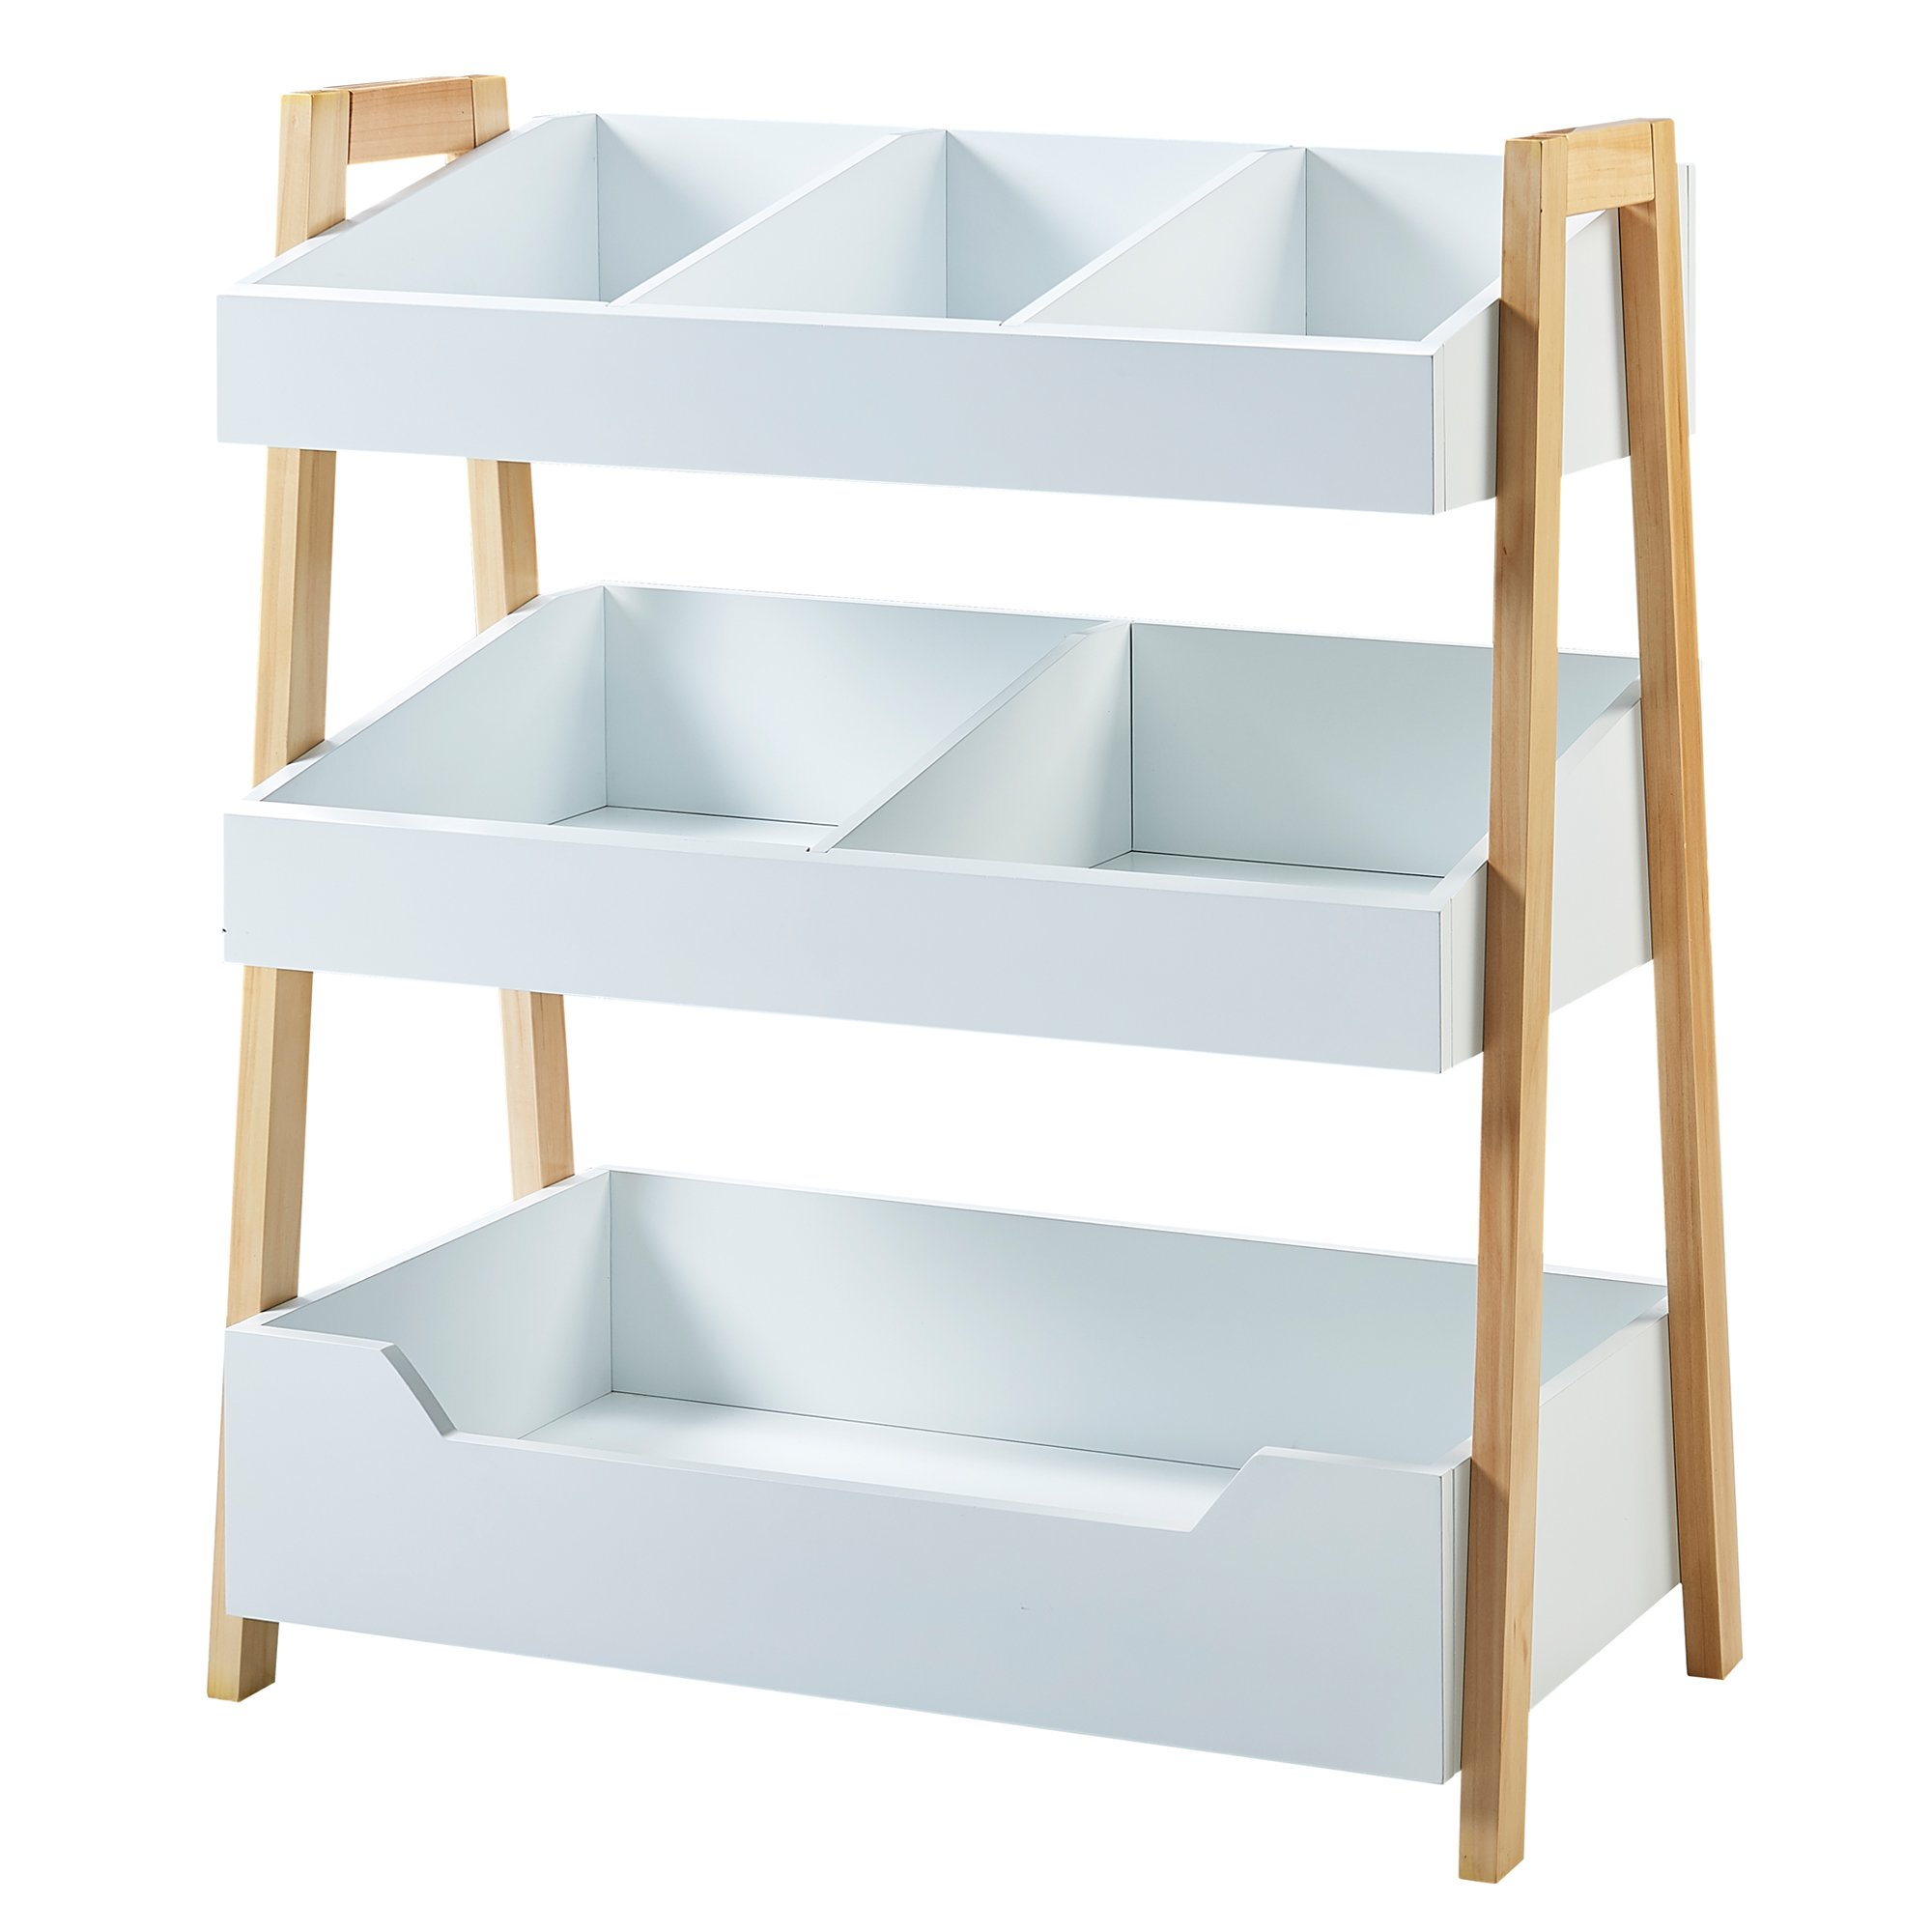 Versanora VNF-00001 Pulire Space Saver Modern and Stylish Cube Shelf-White/Natural